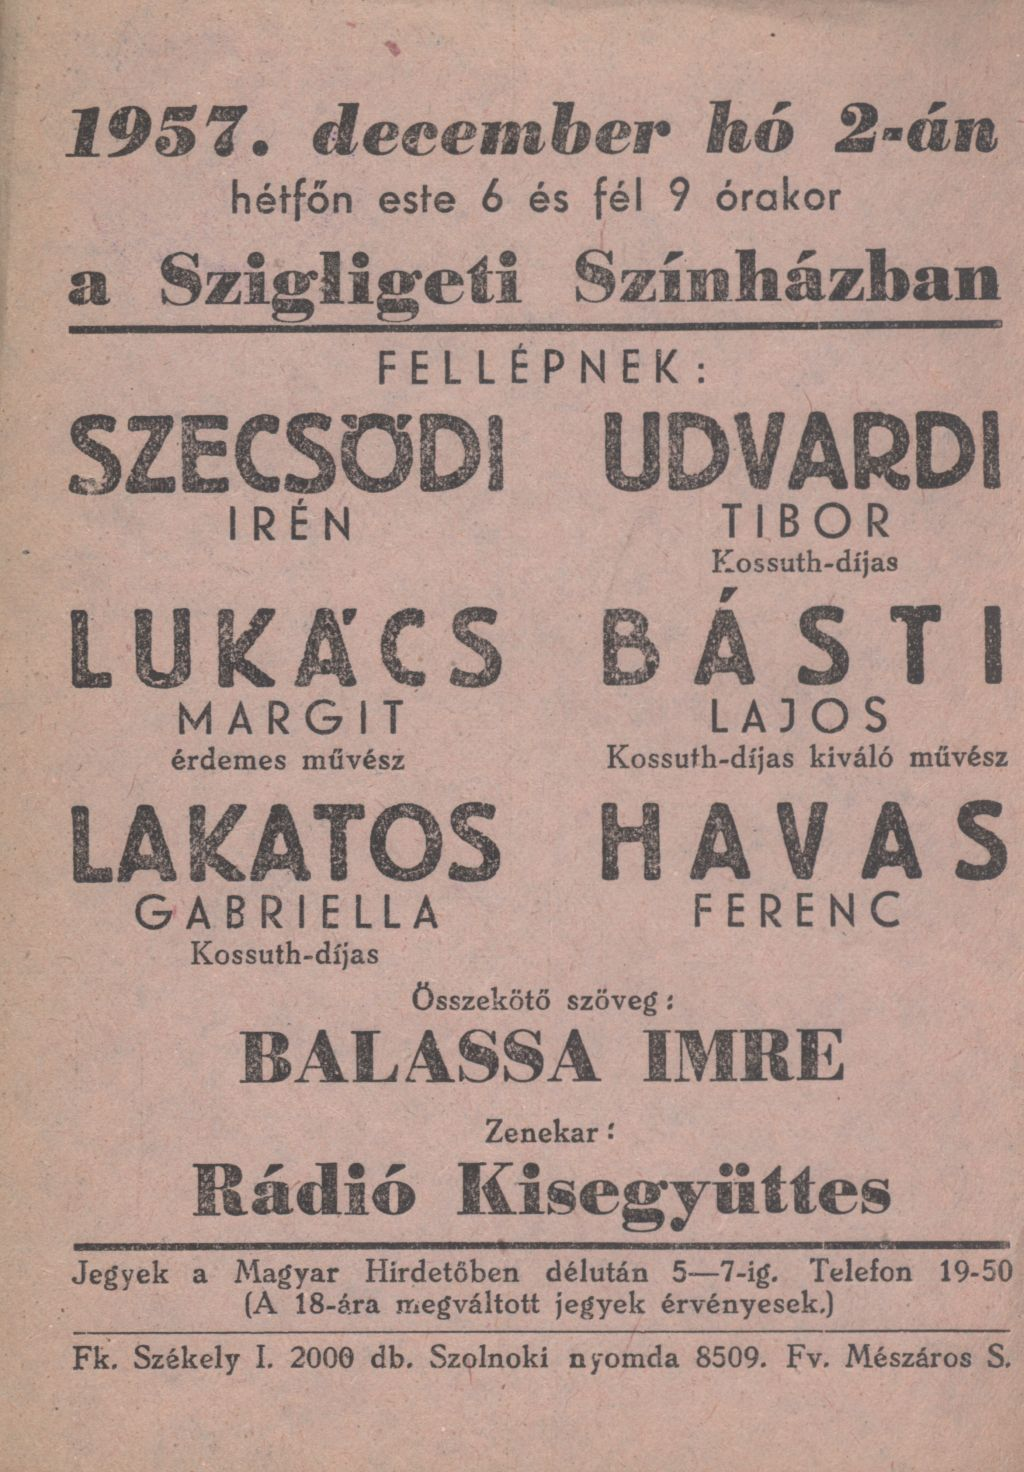 Szigligeti Színház szórólapja